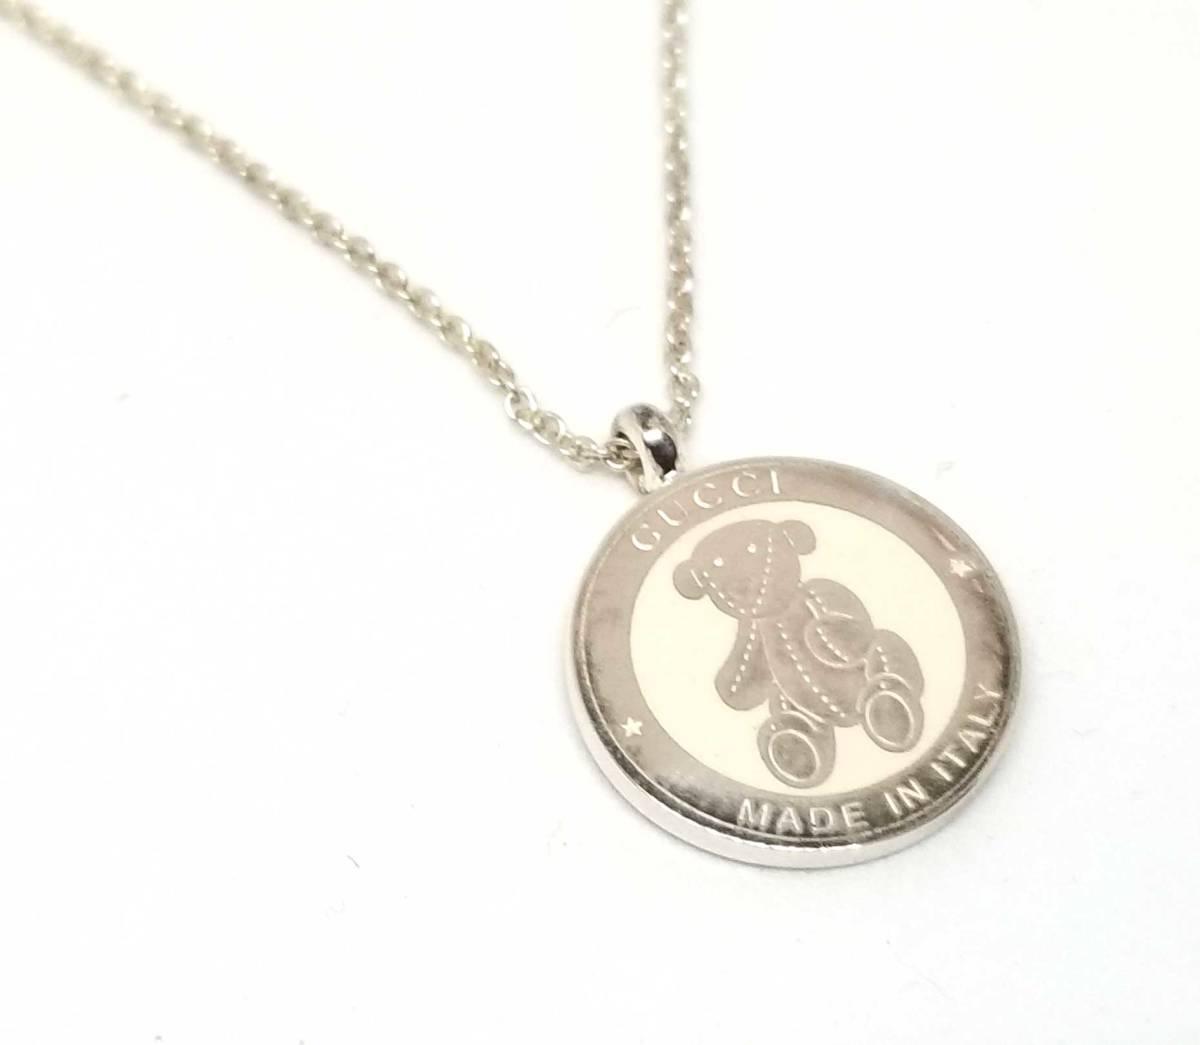 210fa3b0a Gucci teddy bear necklace pendant silver SV925 Lady's 272887 bear GUCCI ...